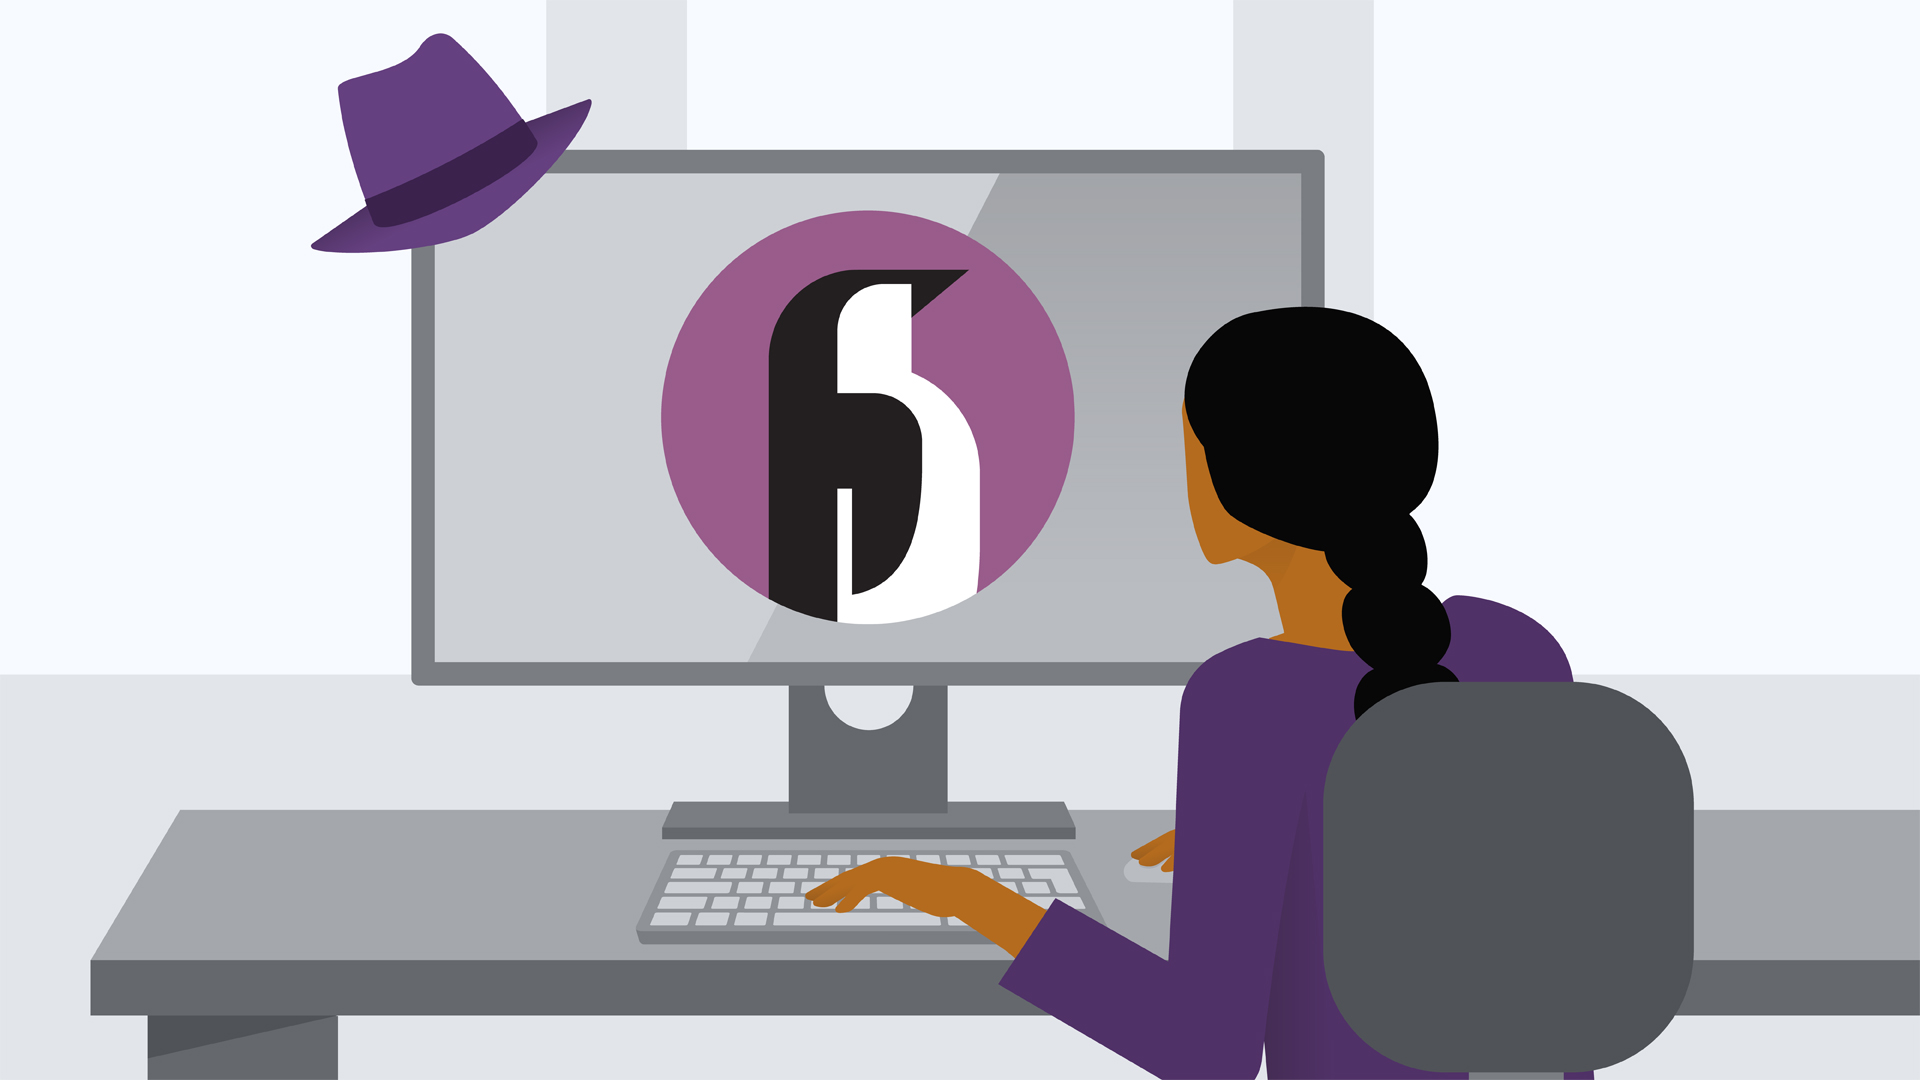 8 razlogov za učenje Linuxa